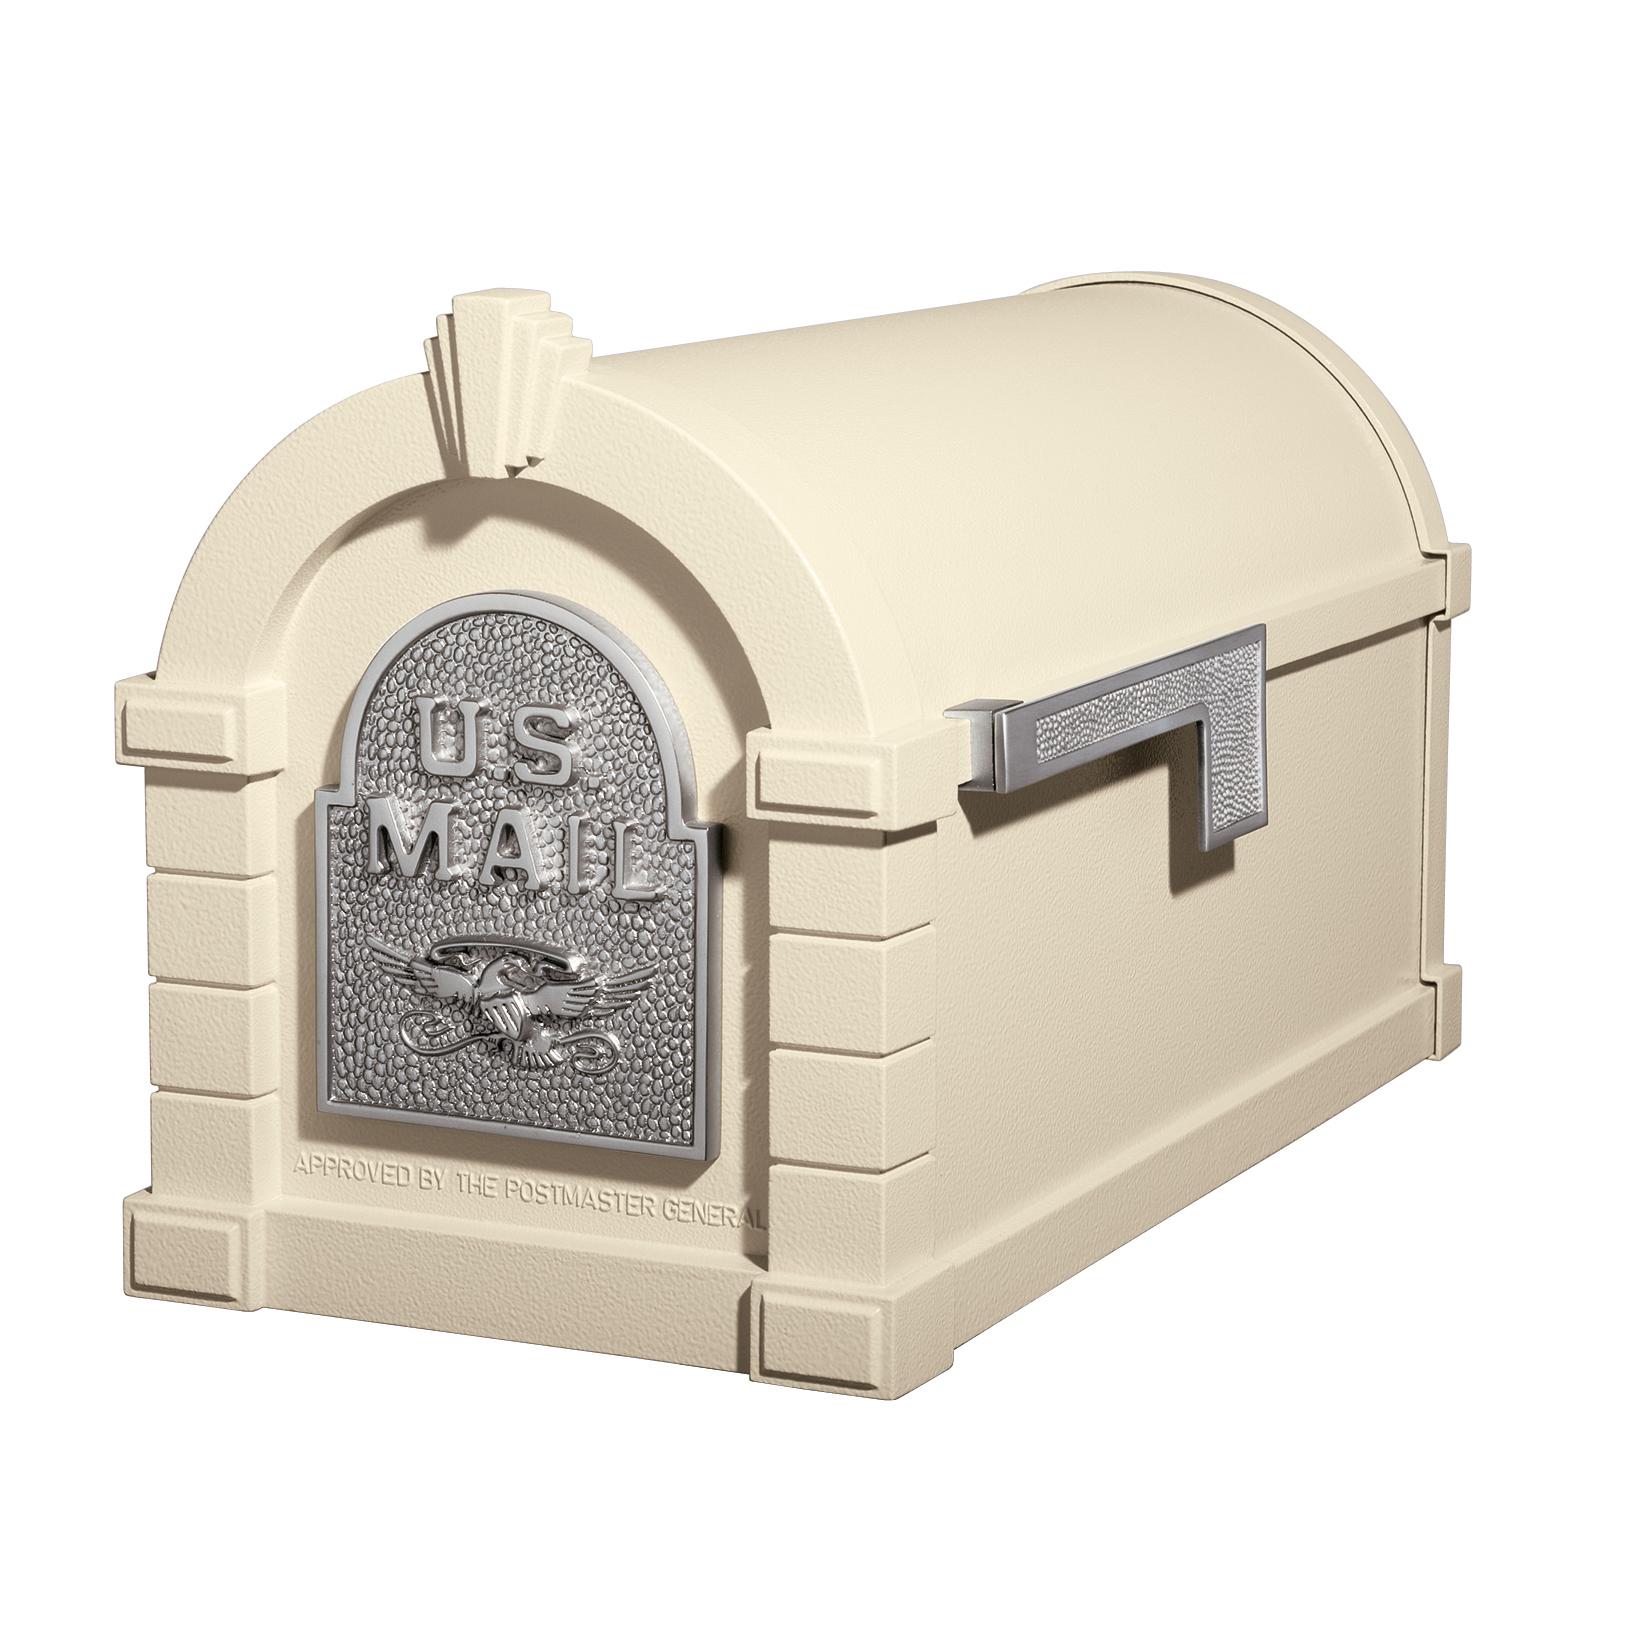 Gaines Eagle Keystone MailboxesAlmond with Satin Nickel